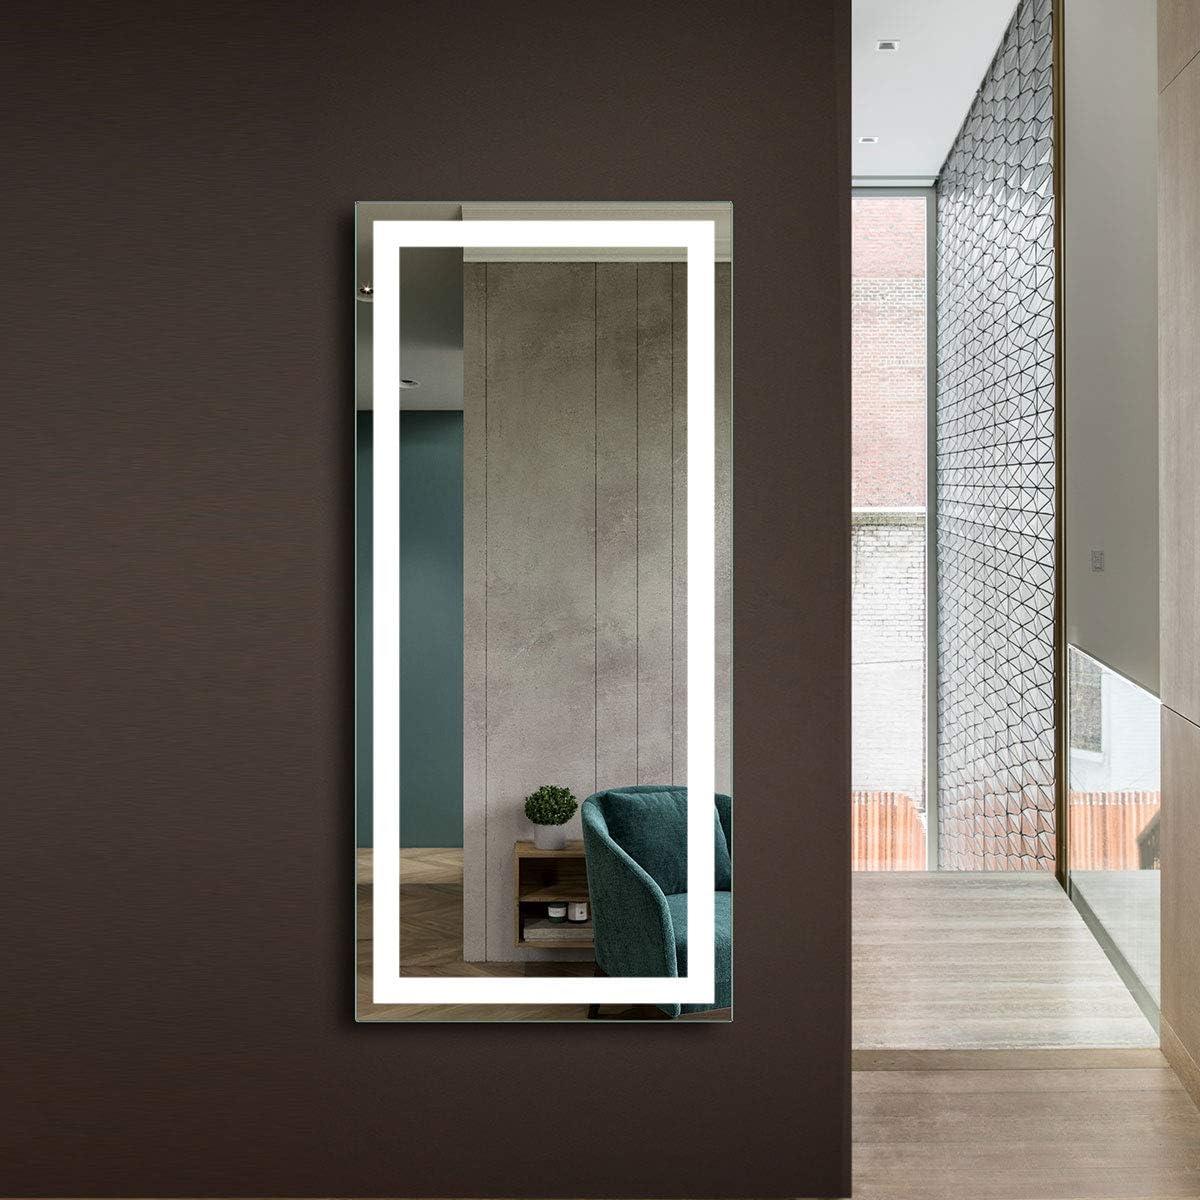 Amazon Com Hyh Full Length Mirror Bedroom Floor Mirror Standing Or Hanging Lighted Oversized Wall Mirror Wall Mirror Decor Lobby Corridor Porch Restaurant D Ck010 Cg Furniture Decor